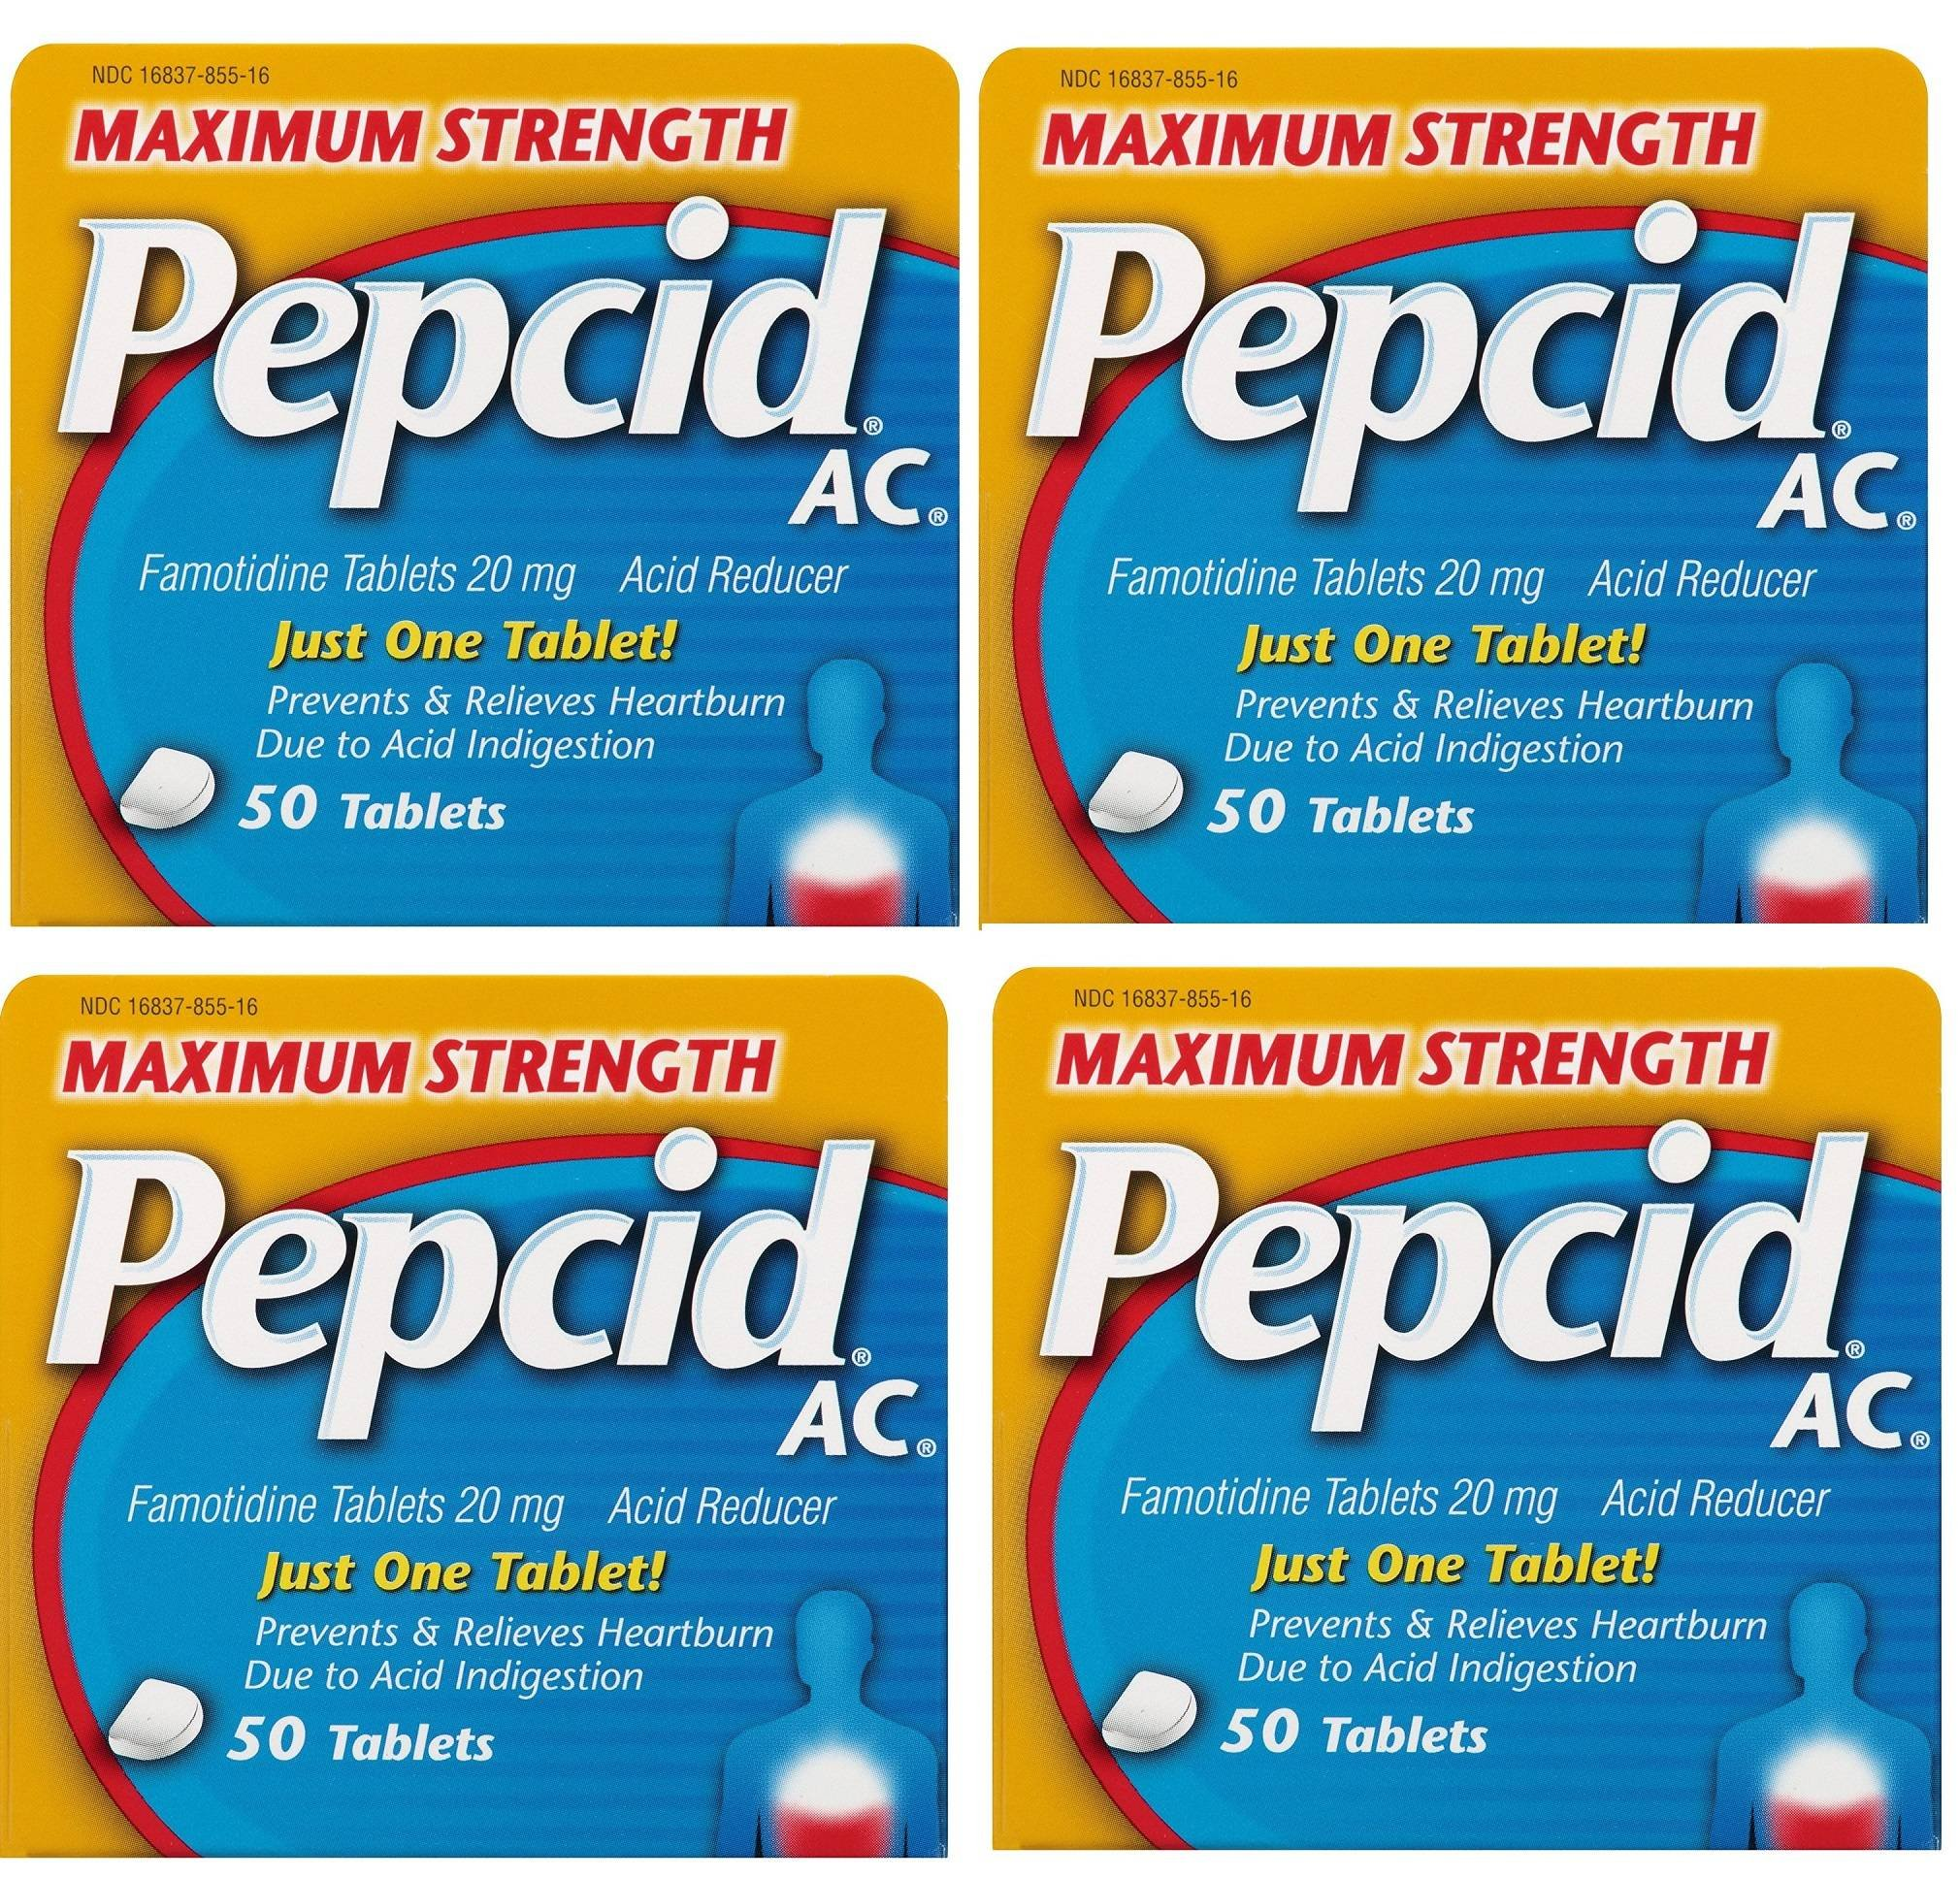 Maximum Strength Pepcid Ac Tablets brXuMe, 200 Count